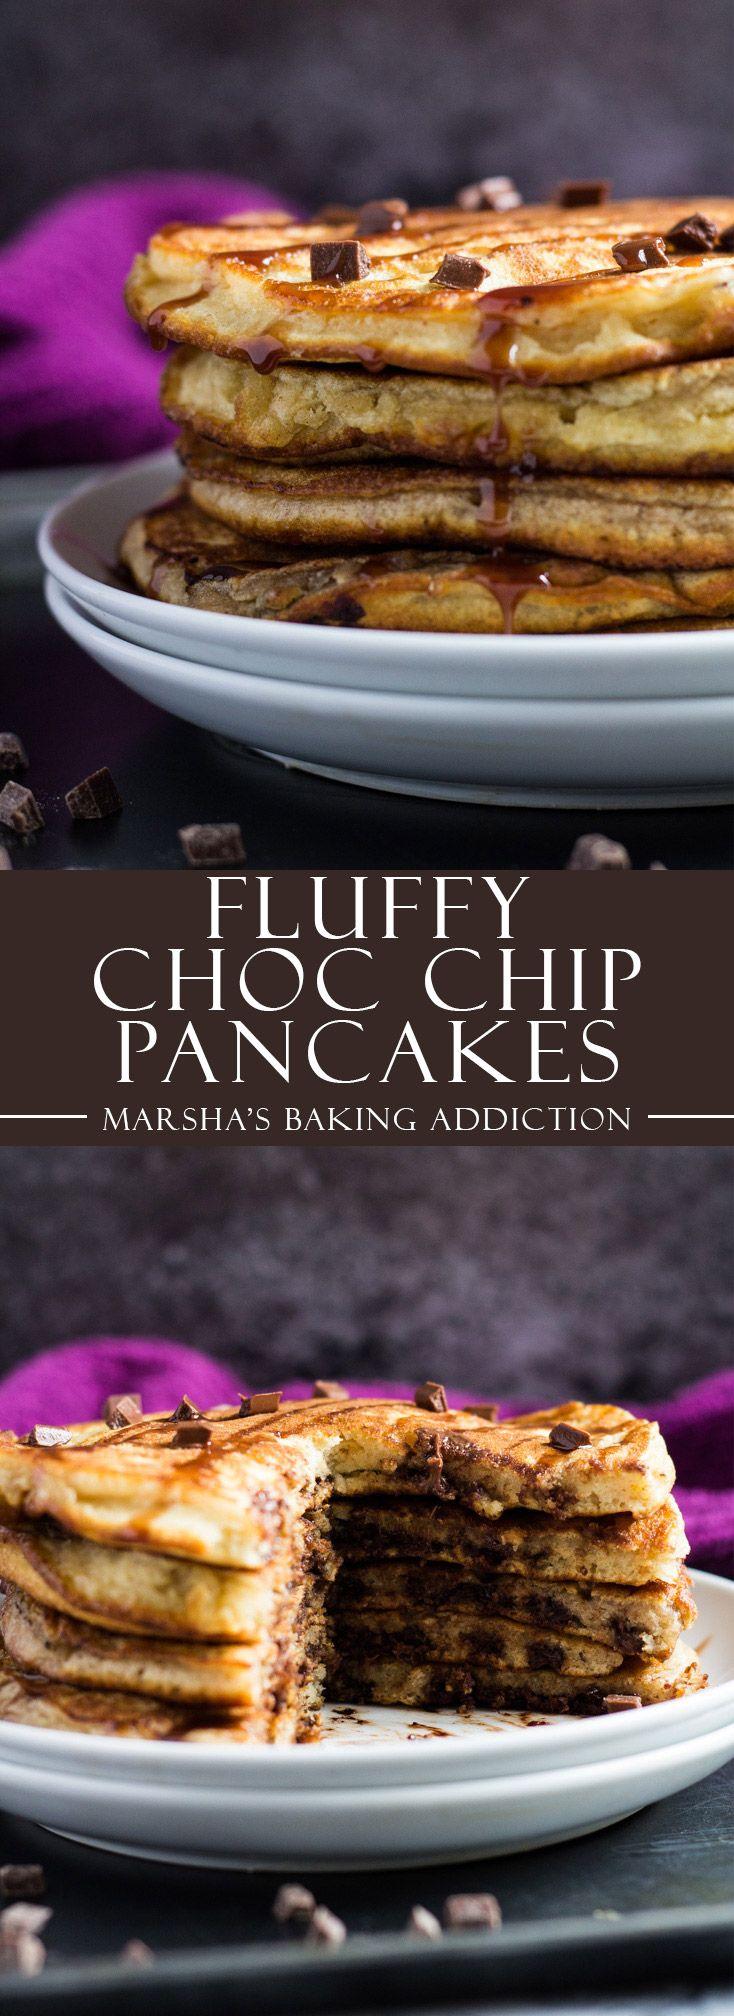 Fluffy Chocolate Chip Pancakes   marshasbakingaddiction.com @marshasbakeblog